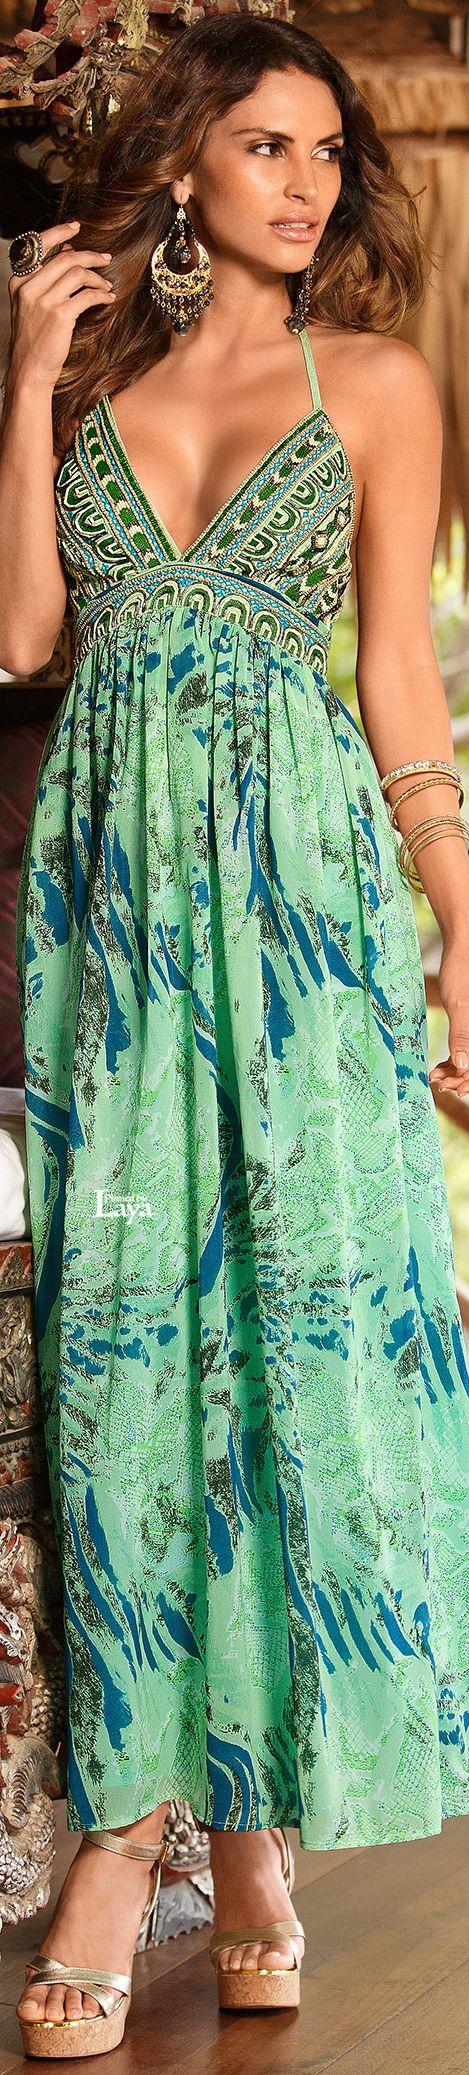 Summer Green Long Dress, Boston Proper